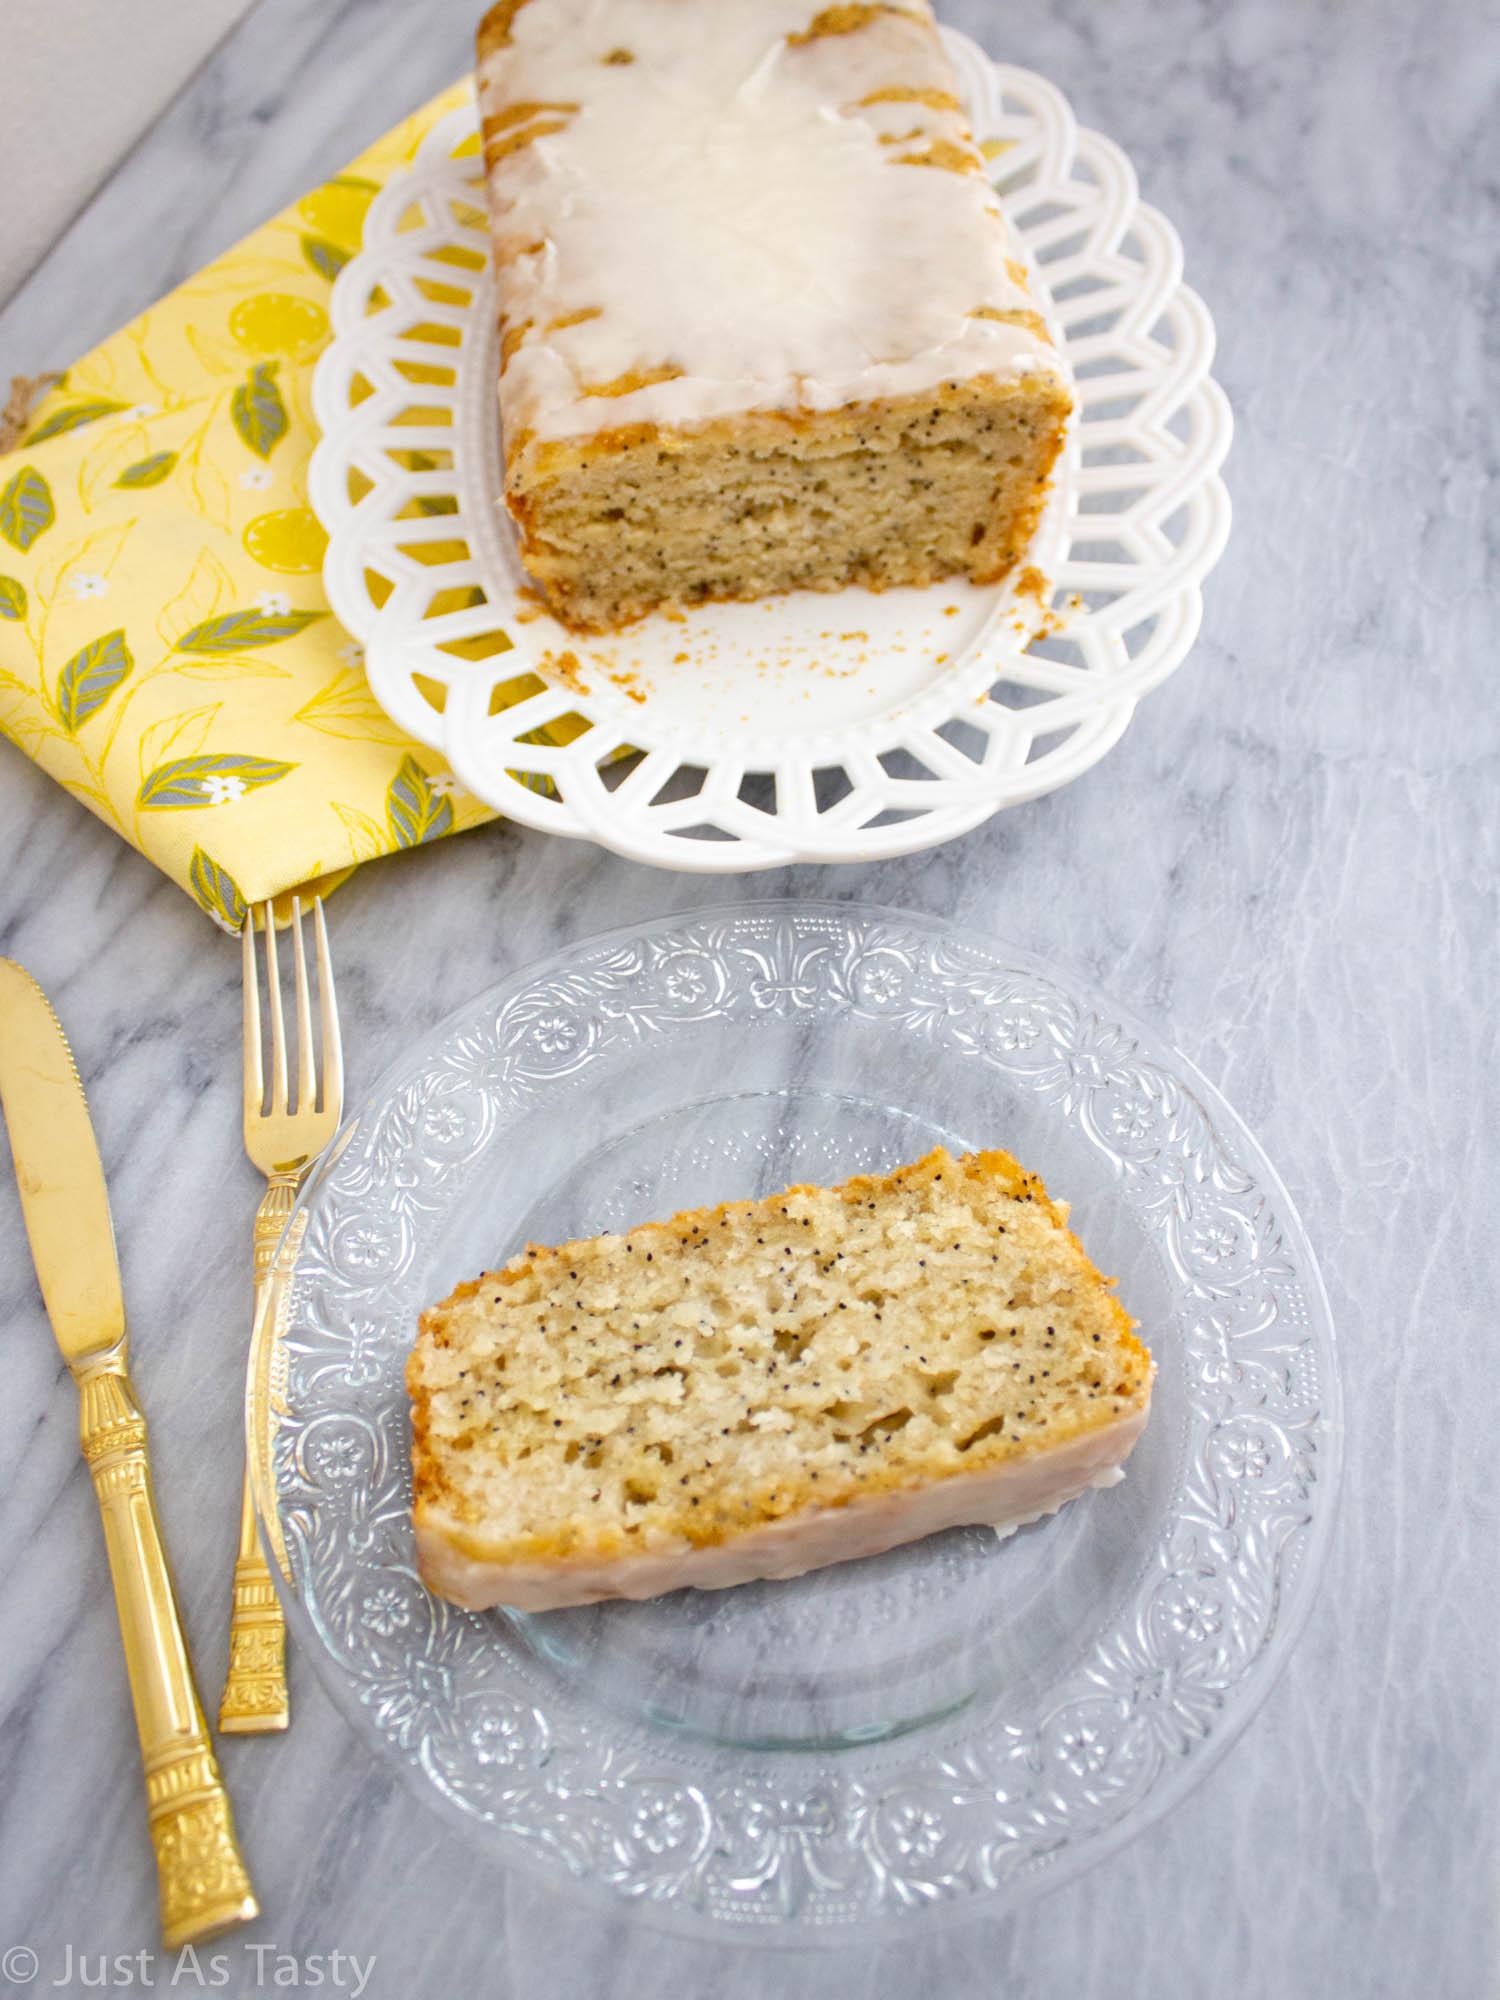 Slice of lemon poppy seed loaf on a glass plate.